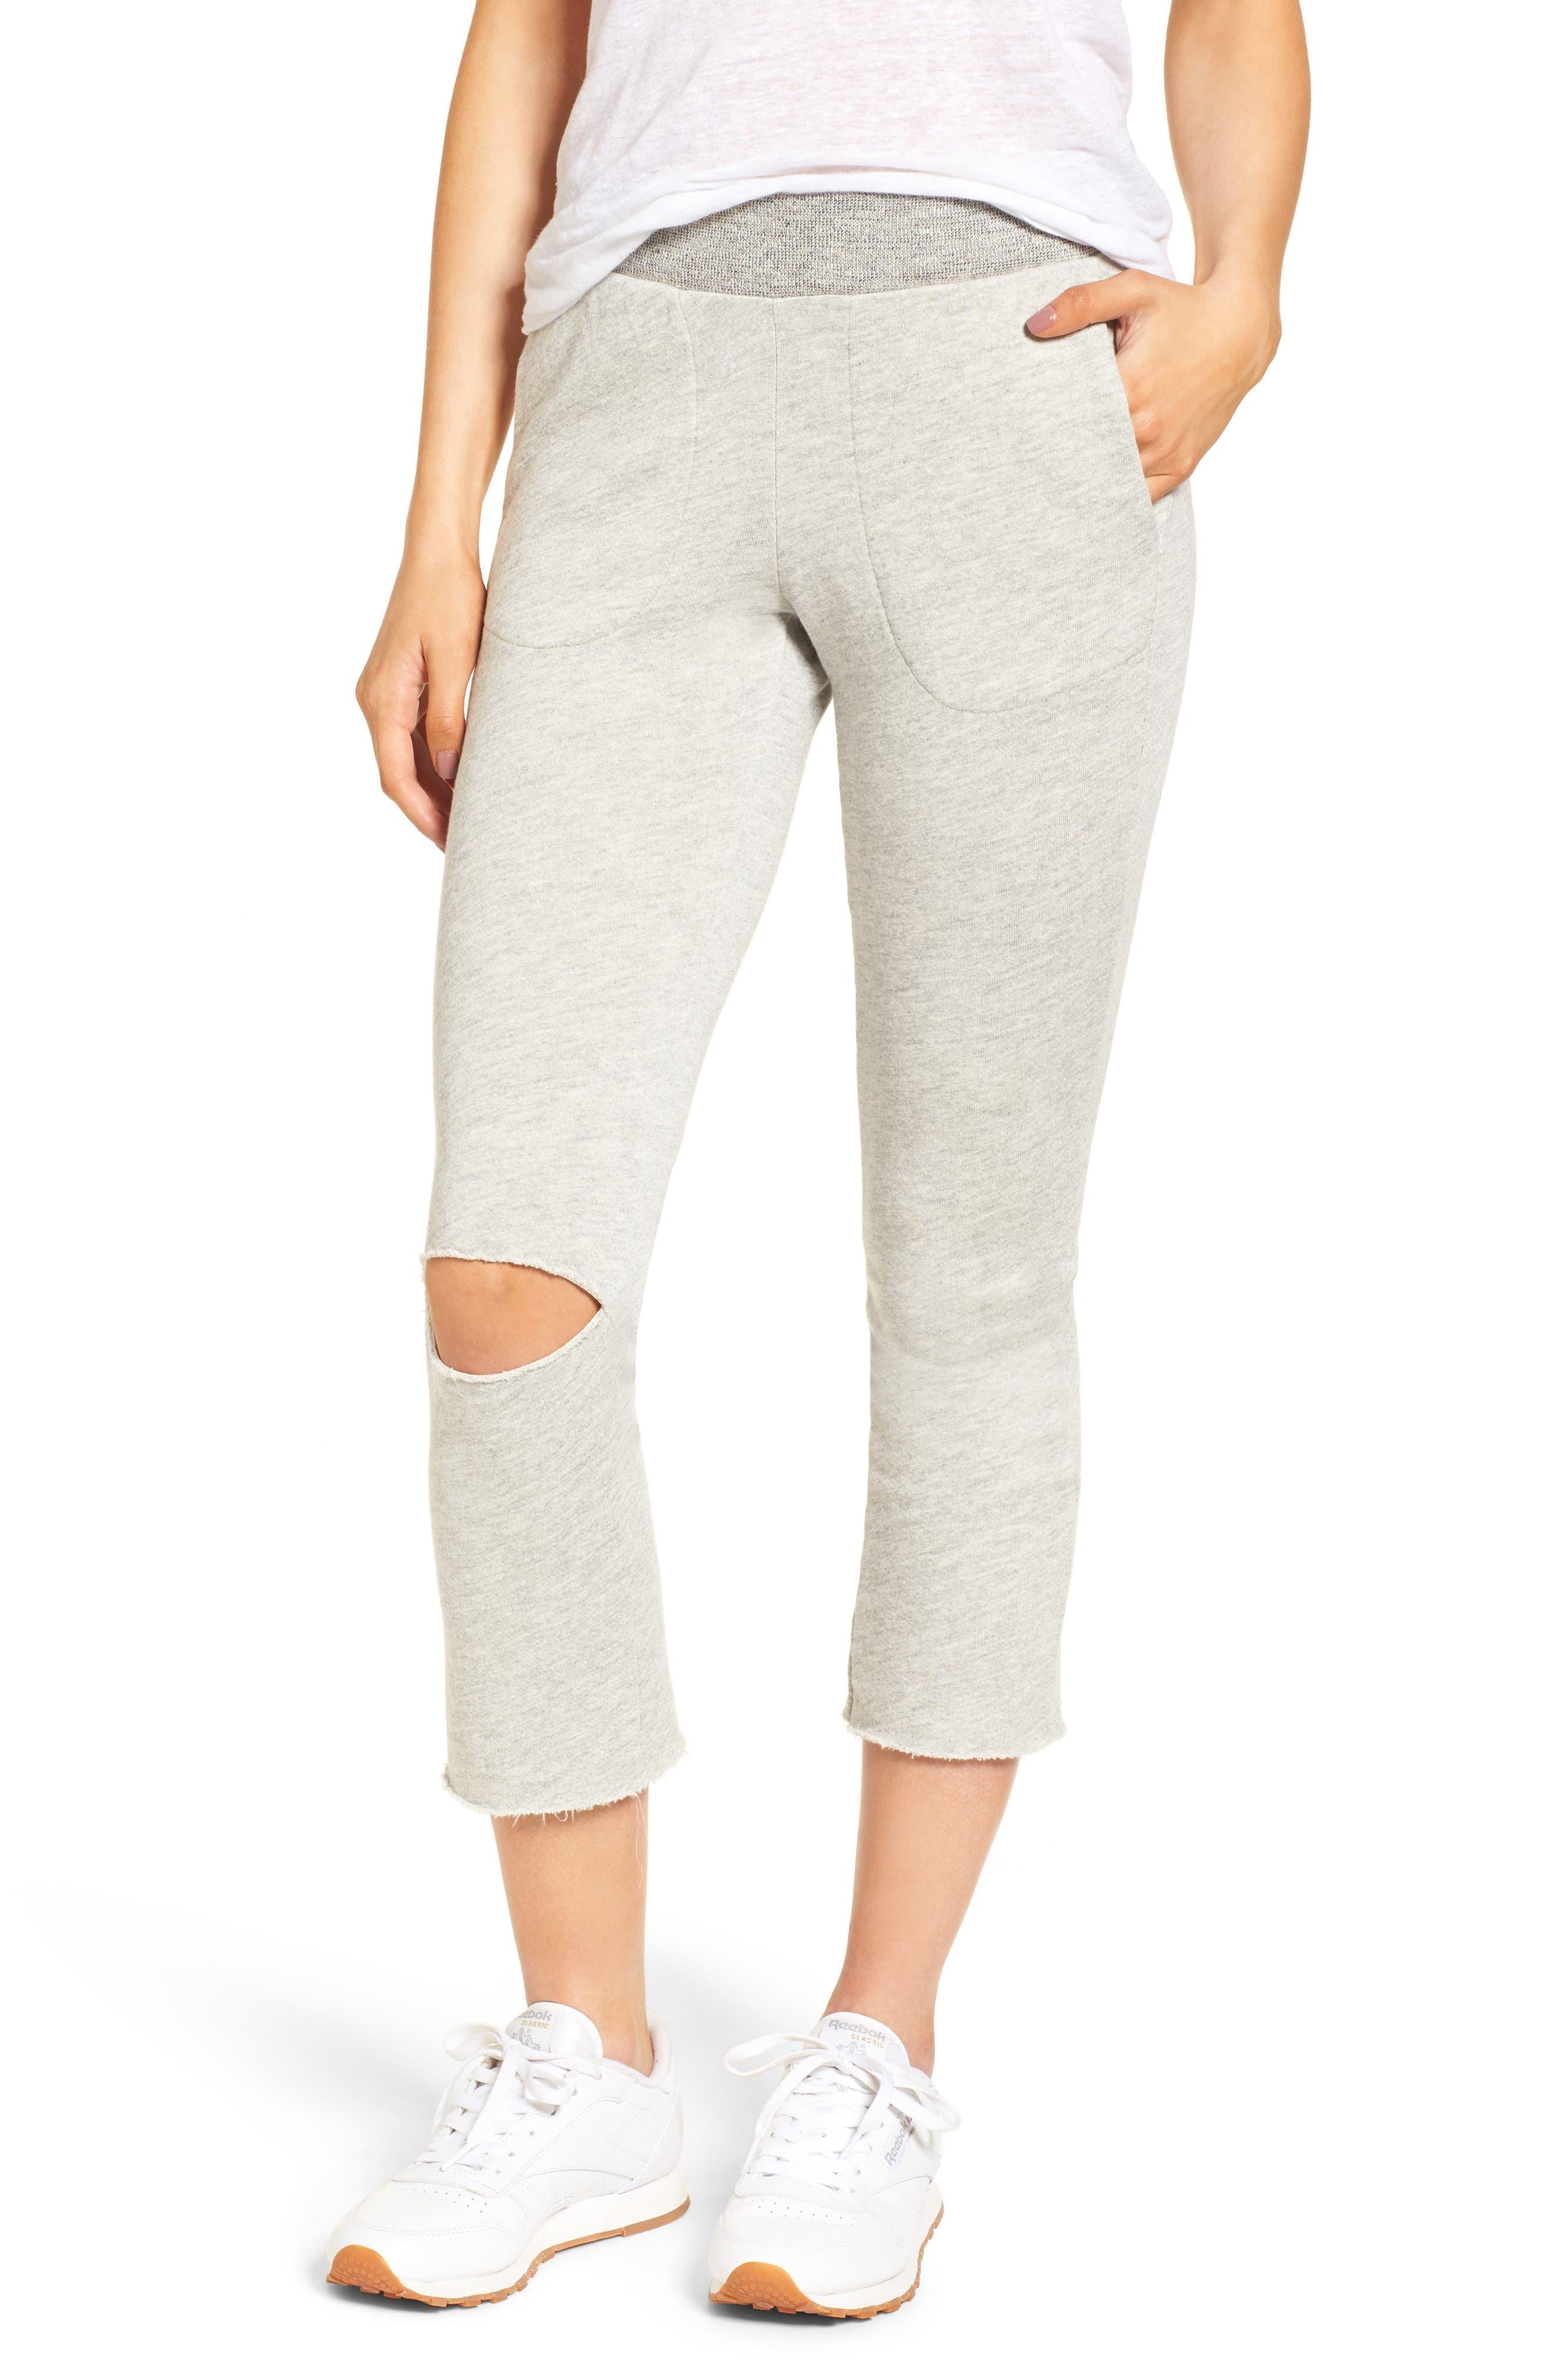 Malibu Slit Knee Sweatpants,                             Main thumbnail 1, color,                             Heather Grey